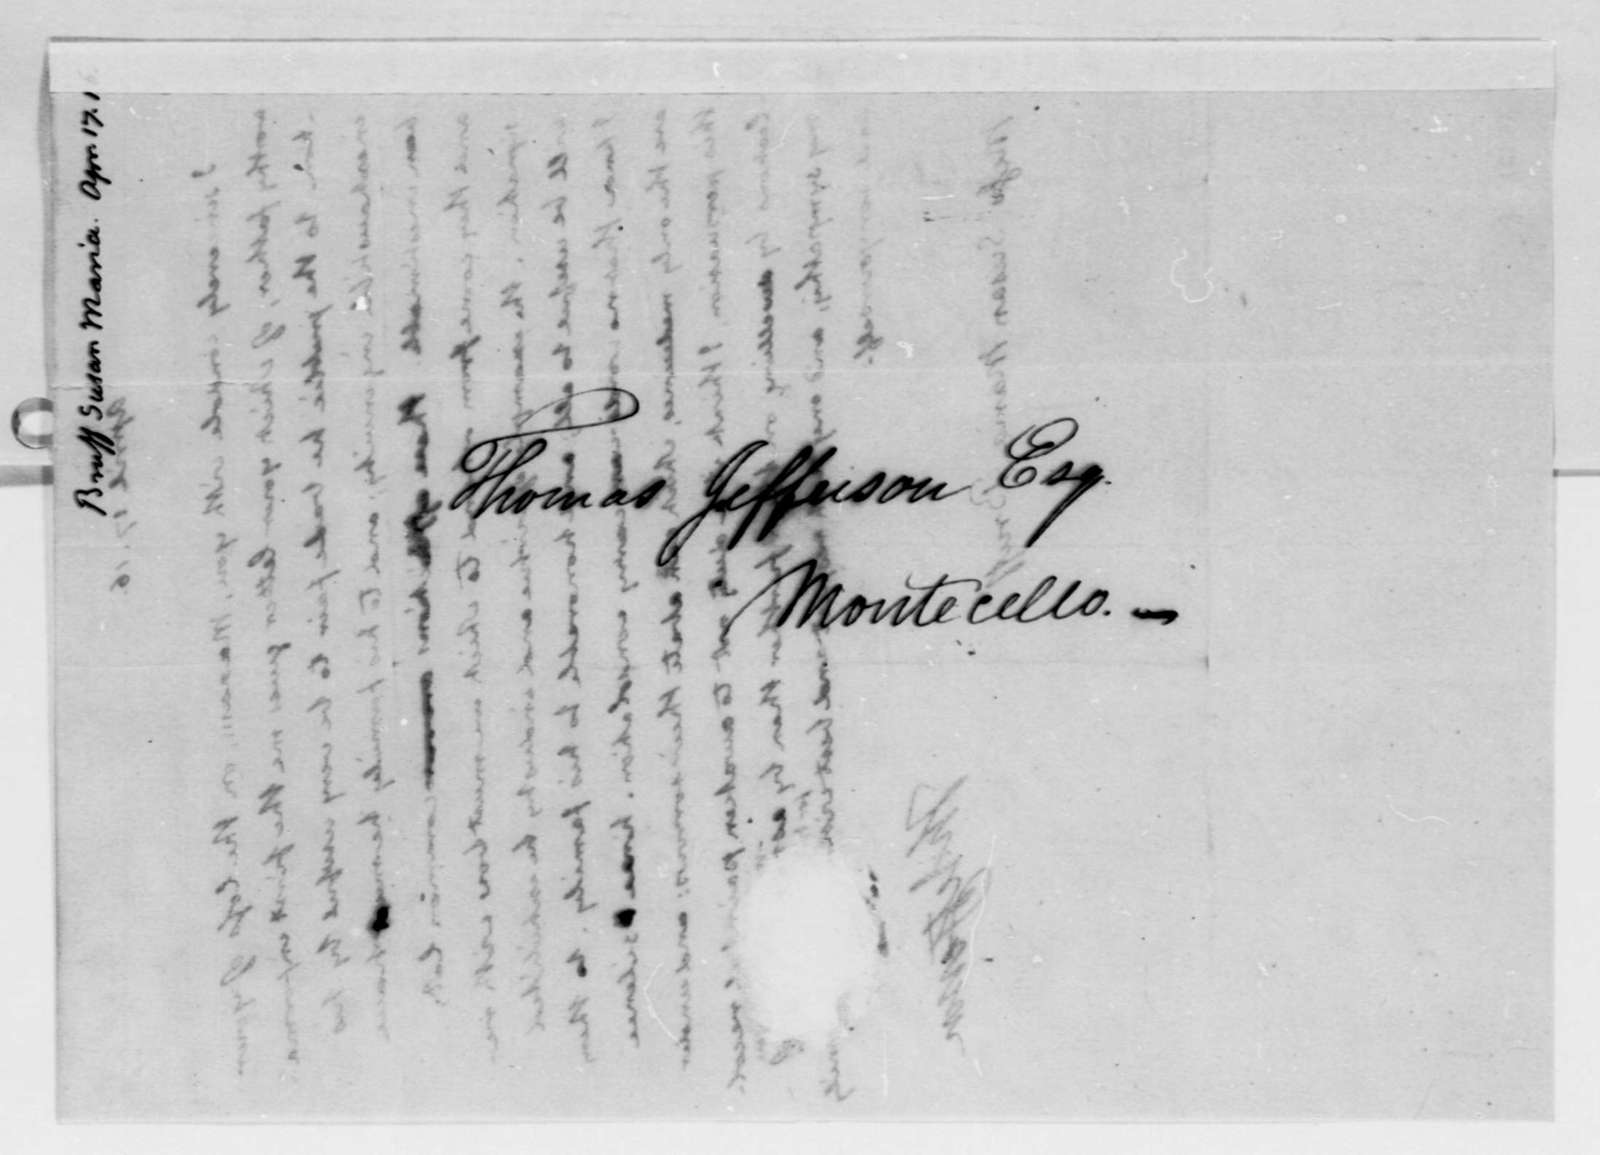 Thomas Jefferson to Susan Maria Bruff, April 17, 1816, with Copy